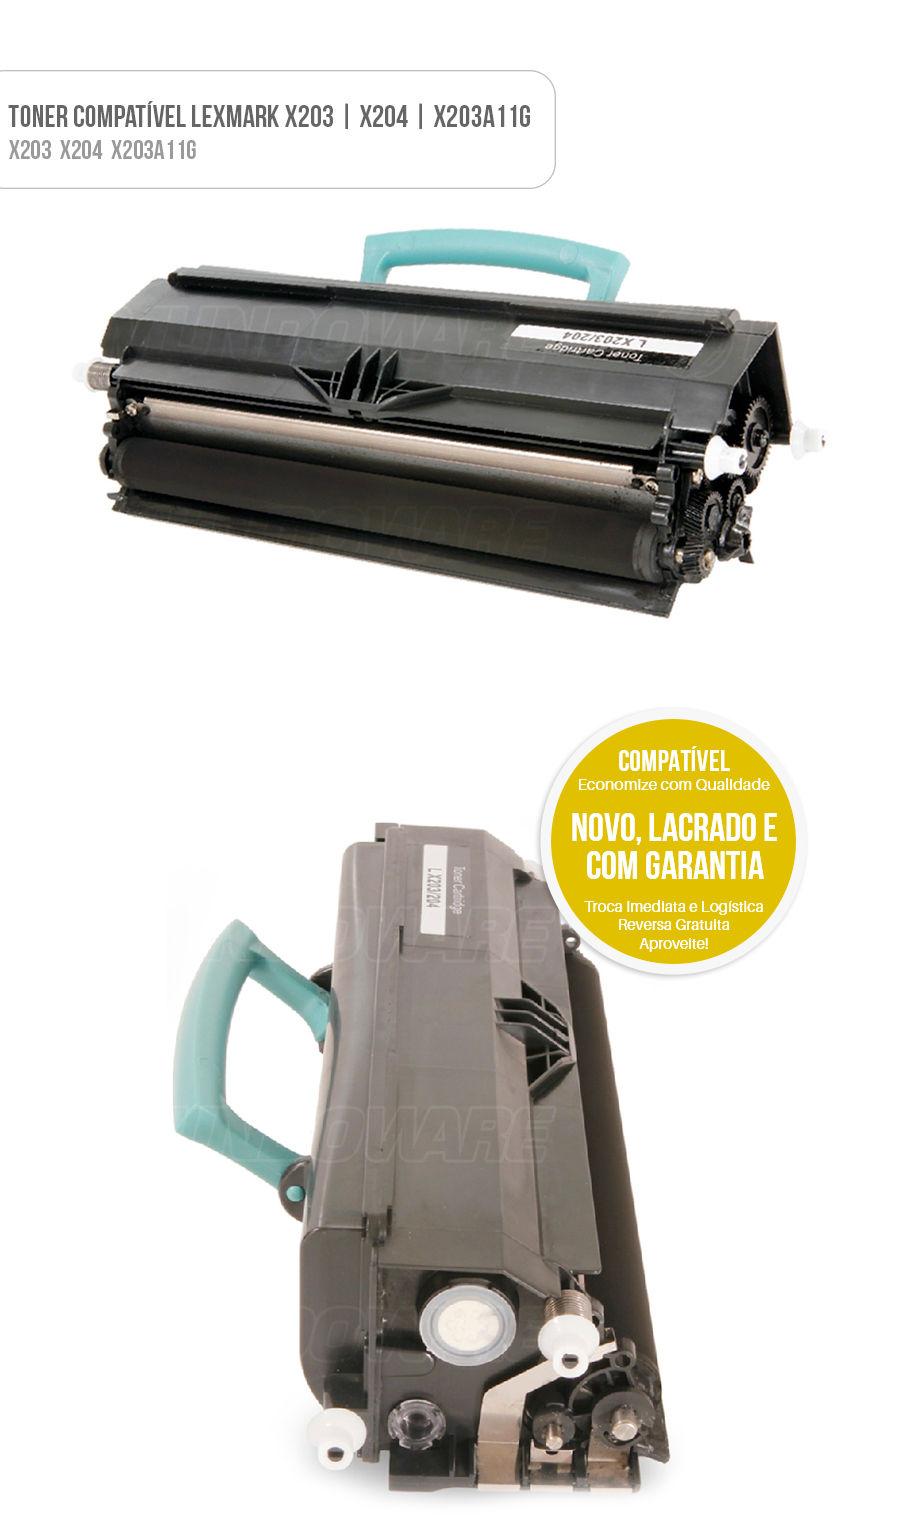 Tonner Compatível Lexmark X203 X204 X203A11G